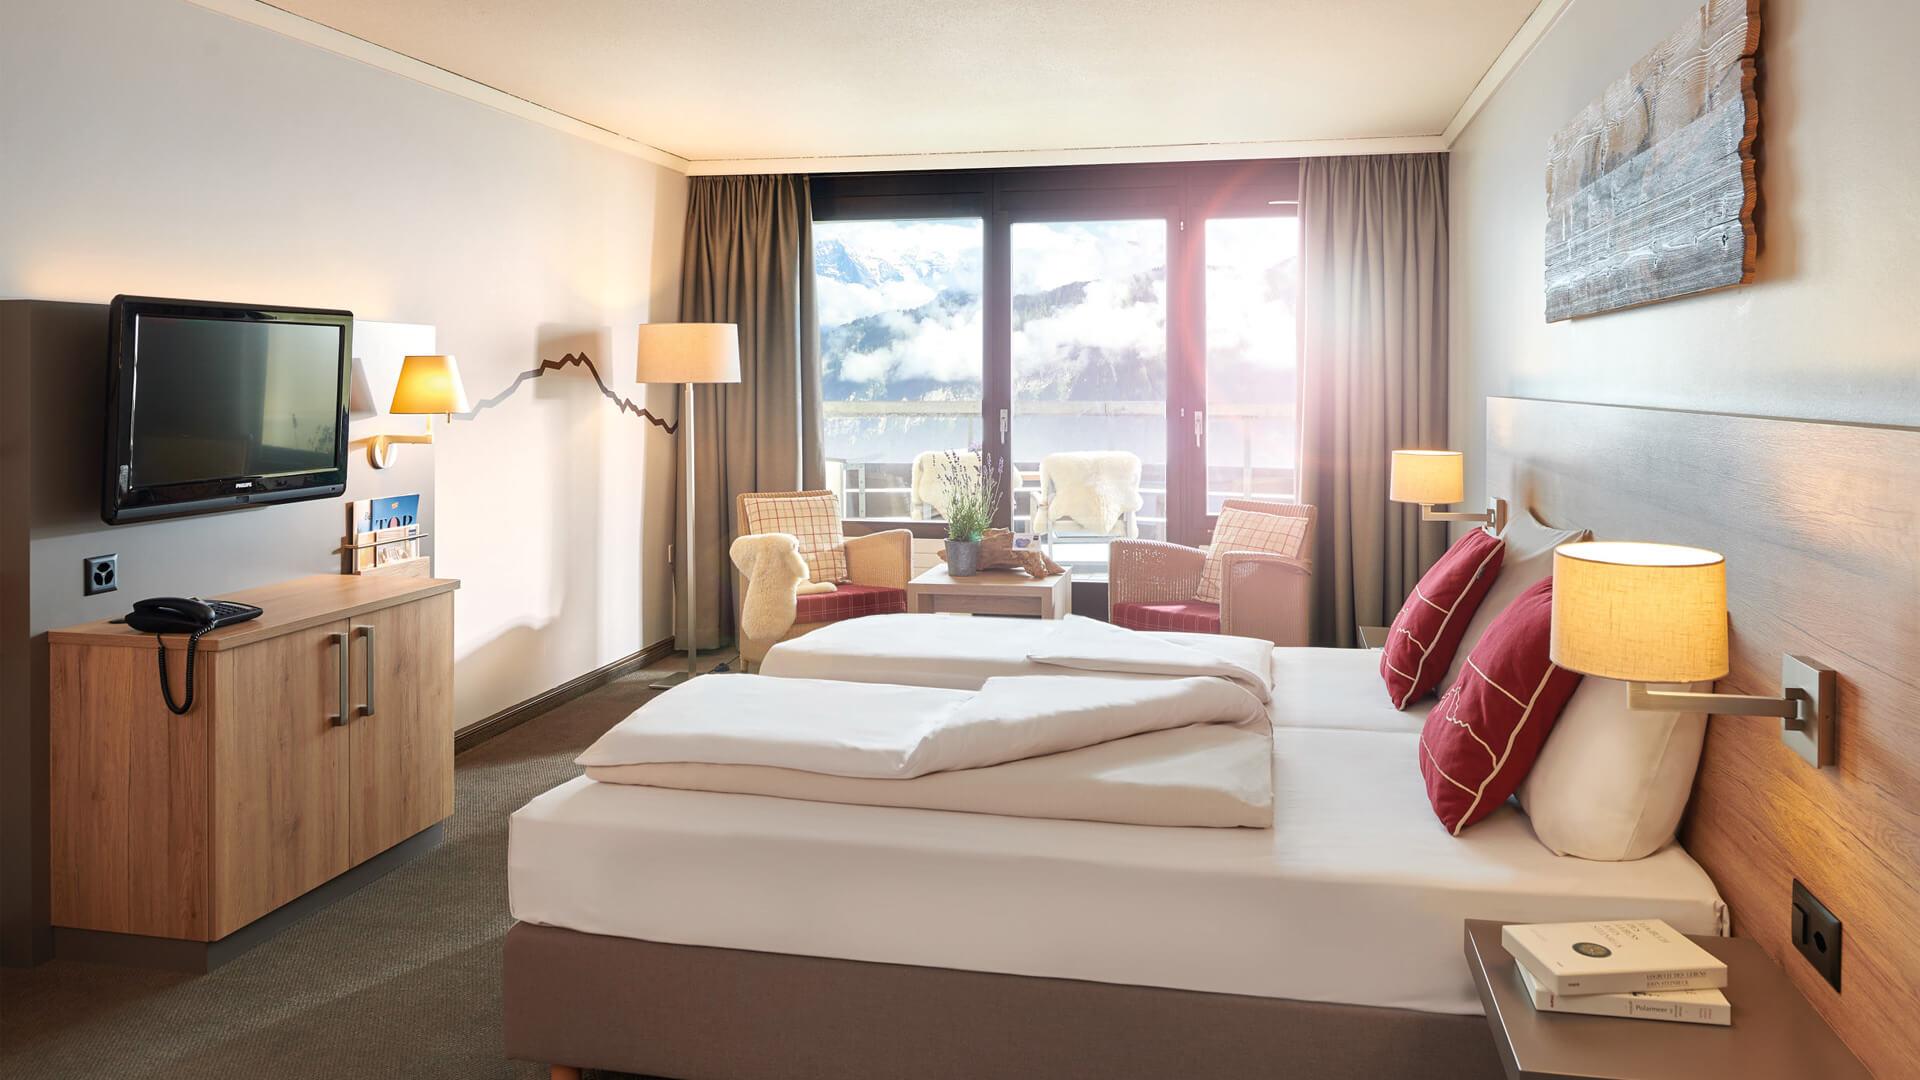 dorint-beatenberg-hotel-zimmer